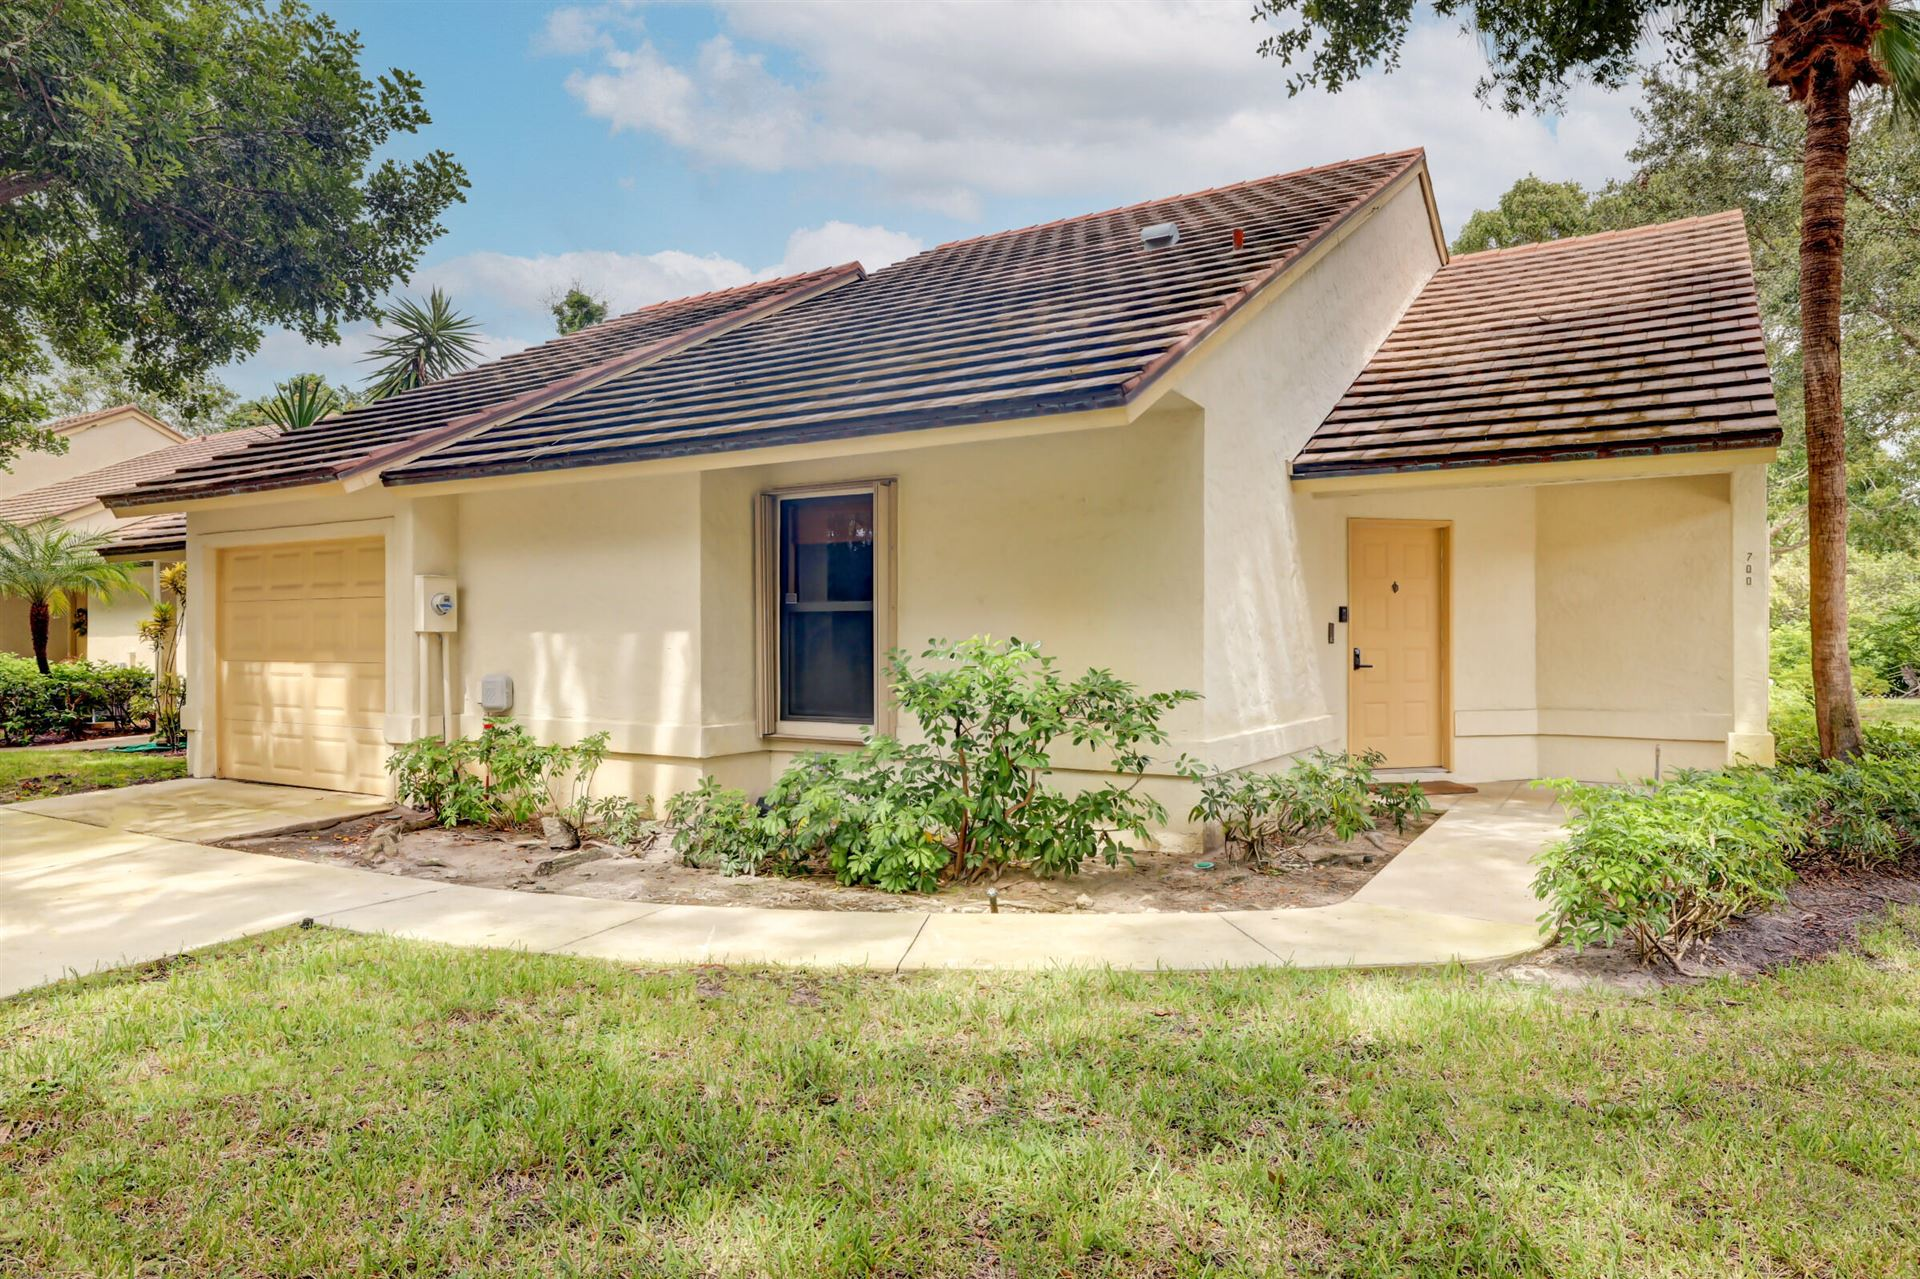 Photo of 700 Bannock Lane, Palm Beach Gardens, FL 33418 (MLS # RX-10741677)